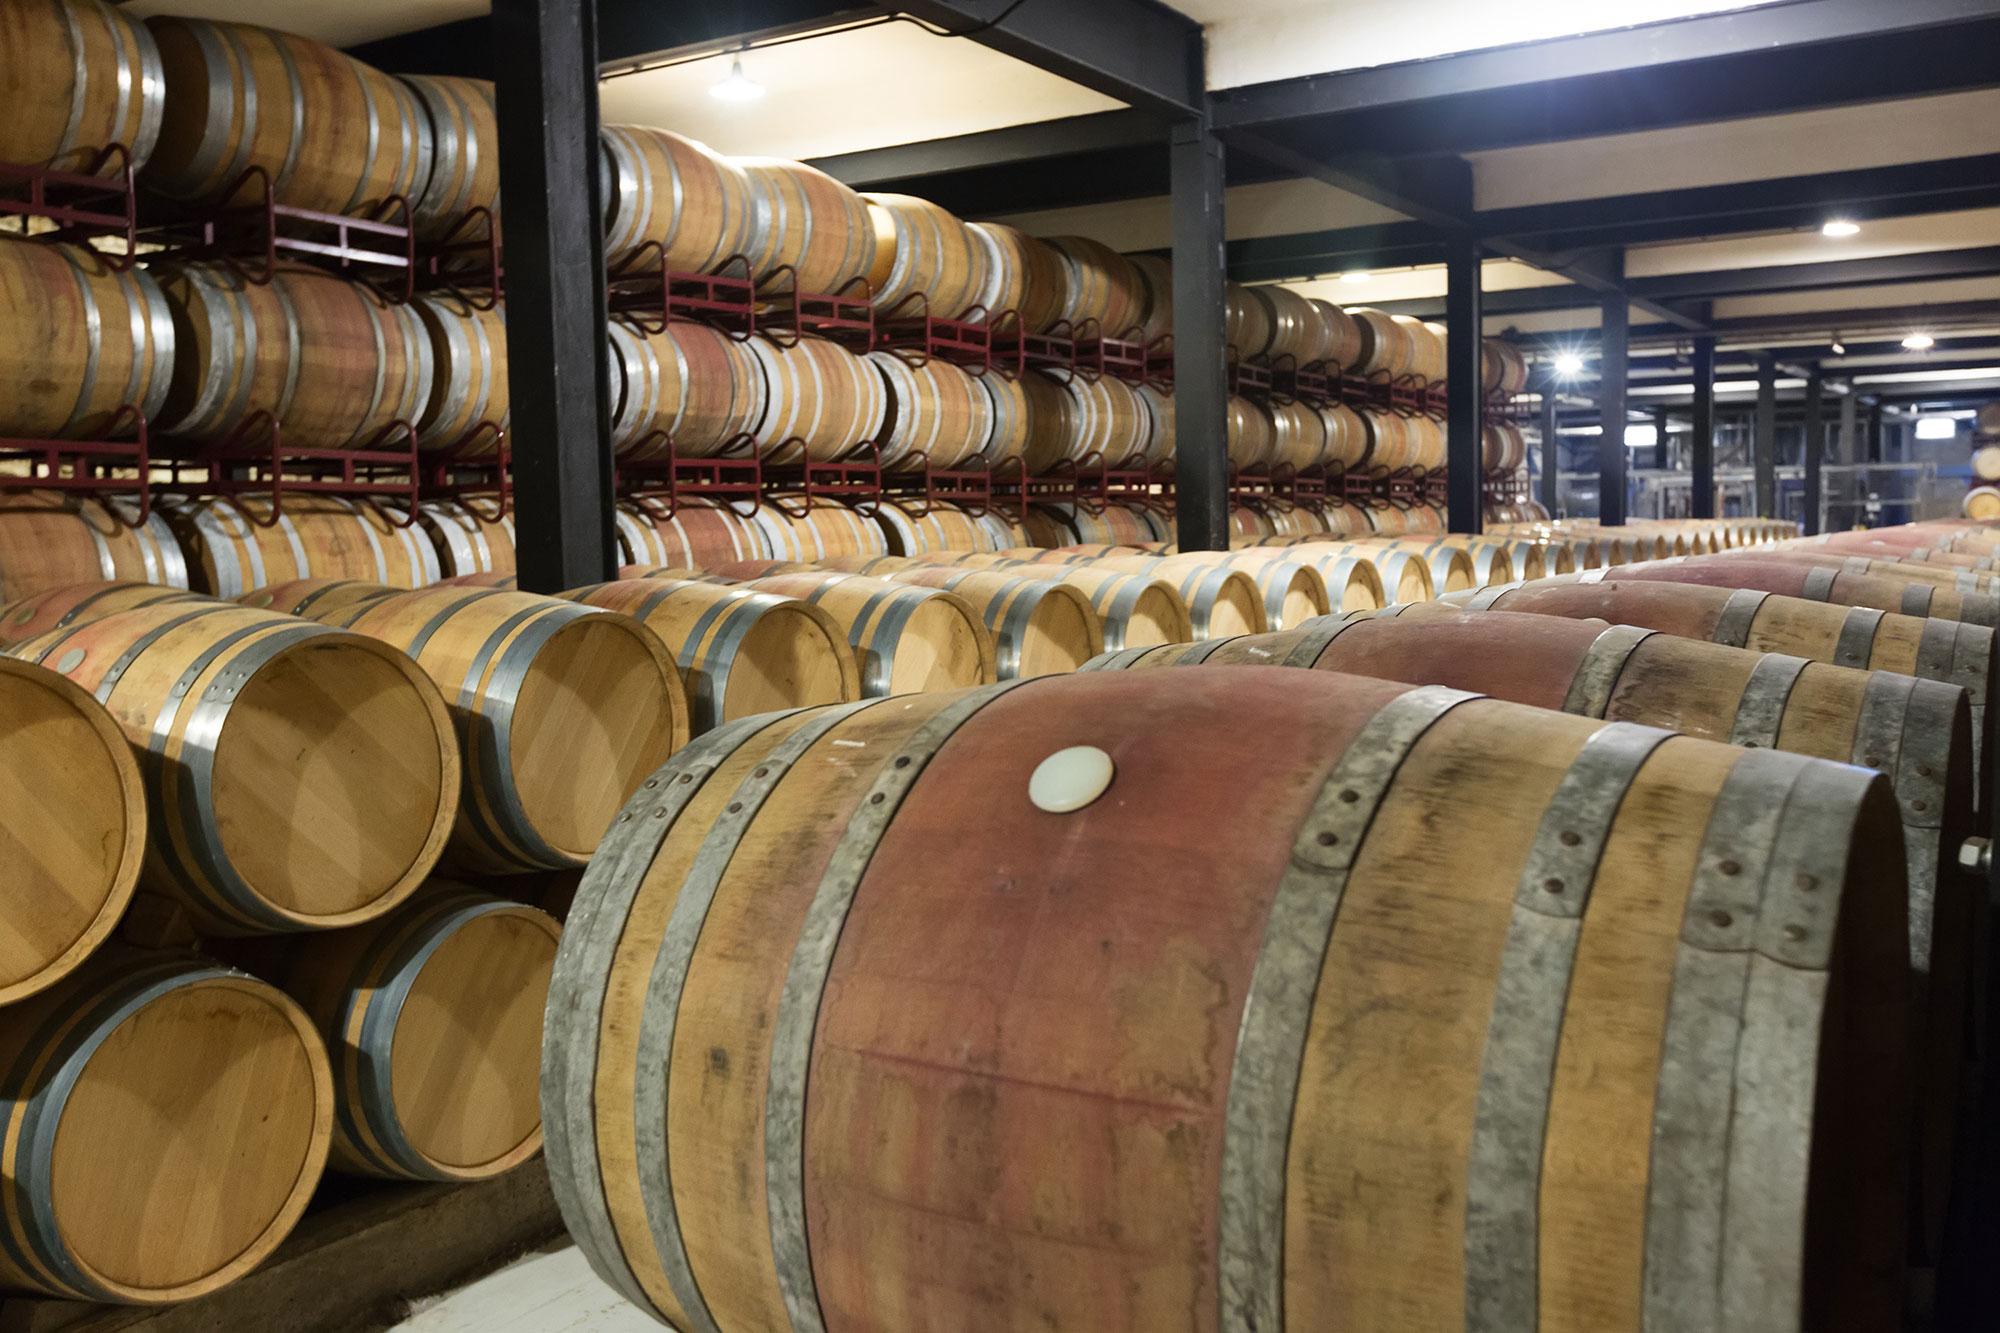 El otoño en la Selva de Irati y la Rioja alavesa - España- imagen #1